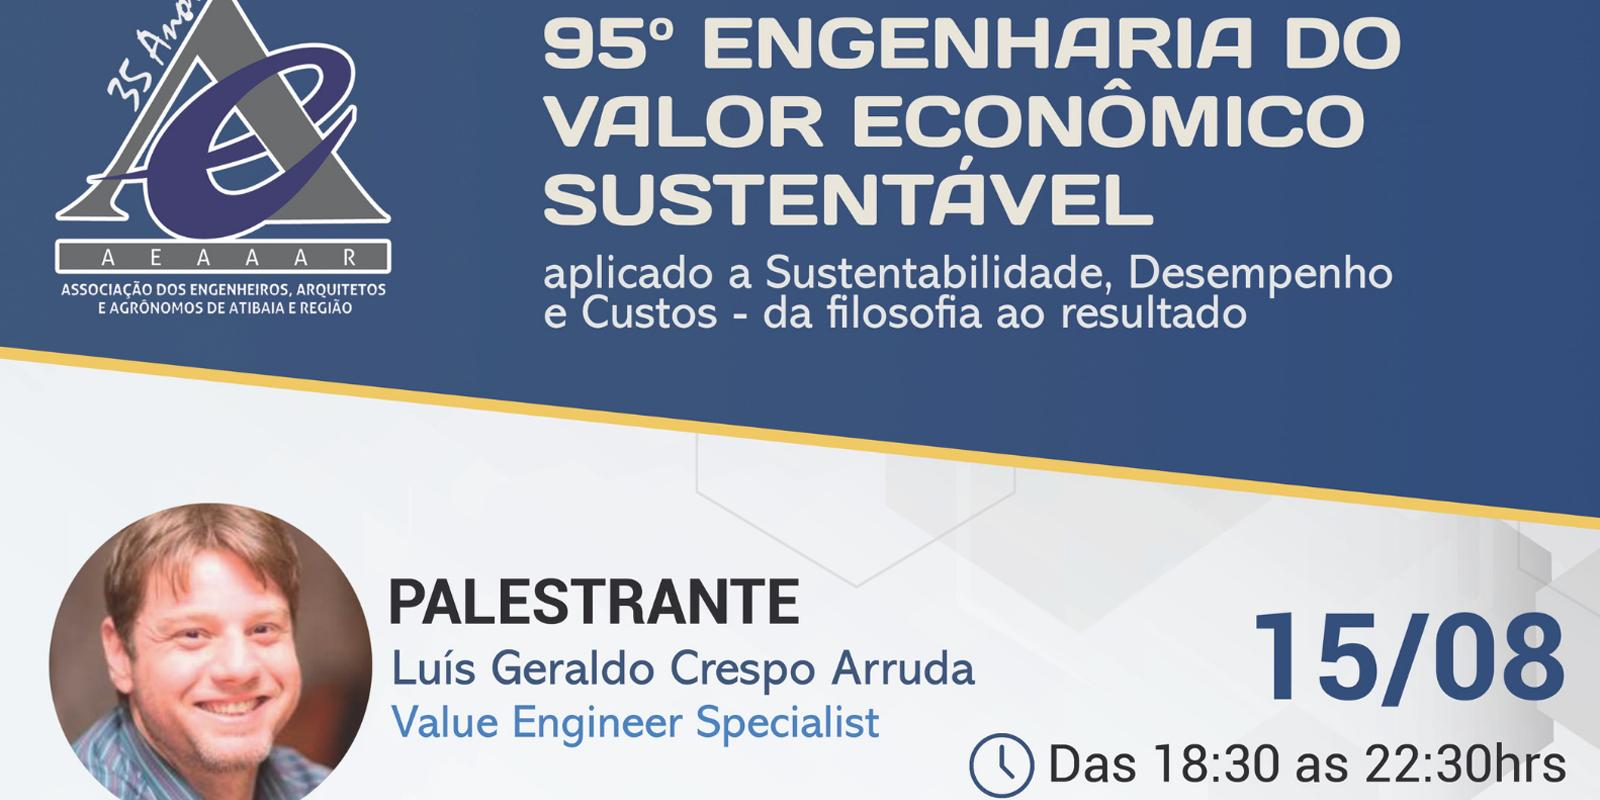 AEAAAR promove palestra 95º Engenharia do Valor Econômico Sustentável